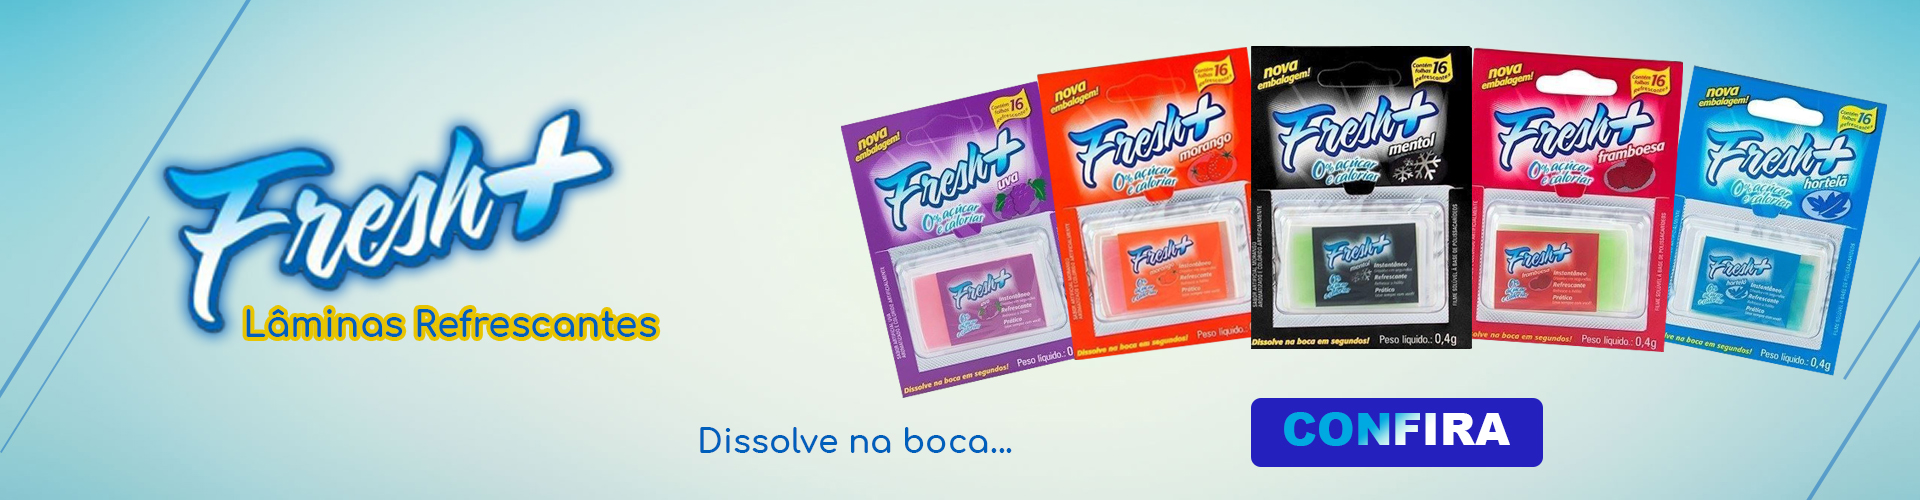 Produto Fresh + laminas refrescantes - Gall